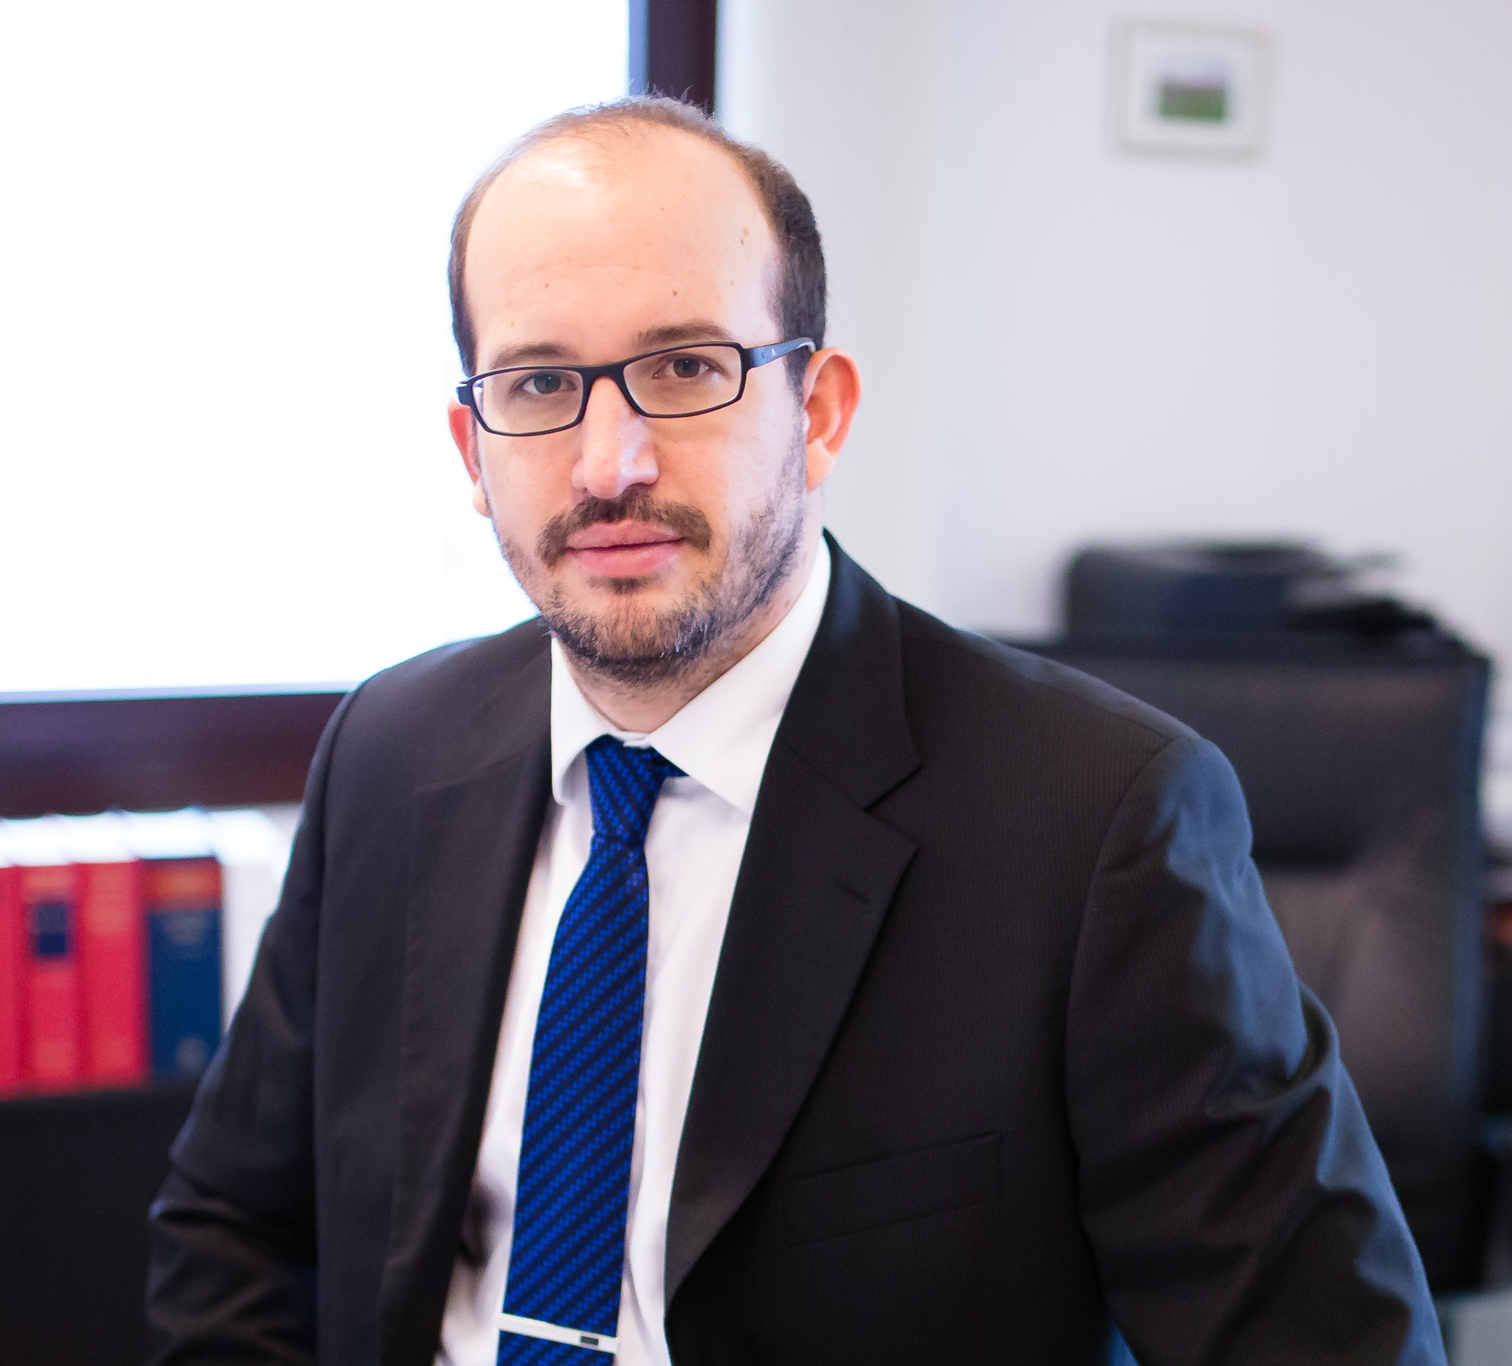 Anwalt für Verkehrsrecht in Offenbach - Tristan Remspecher